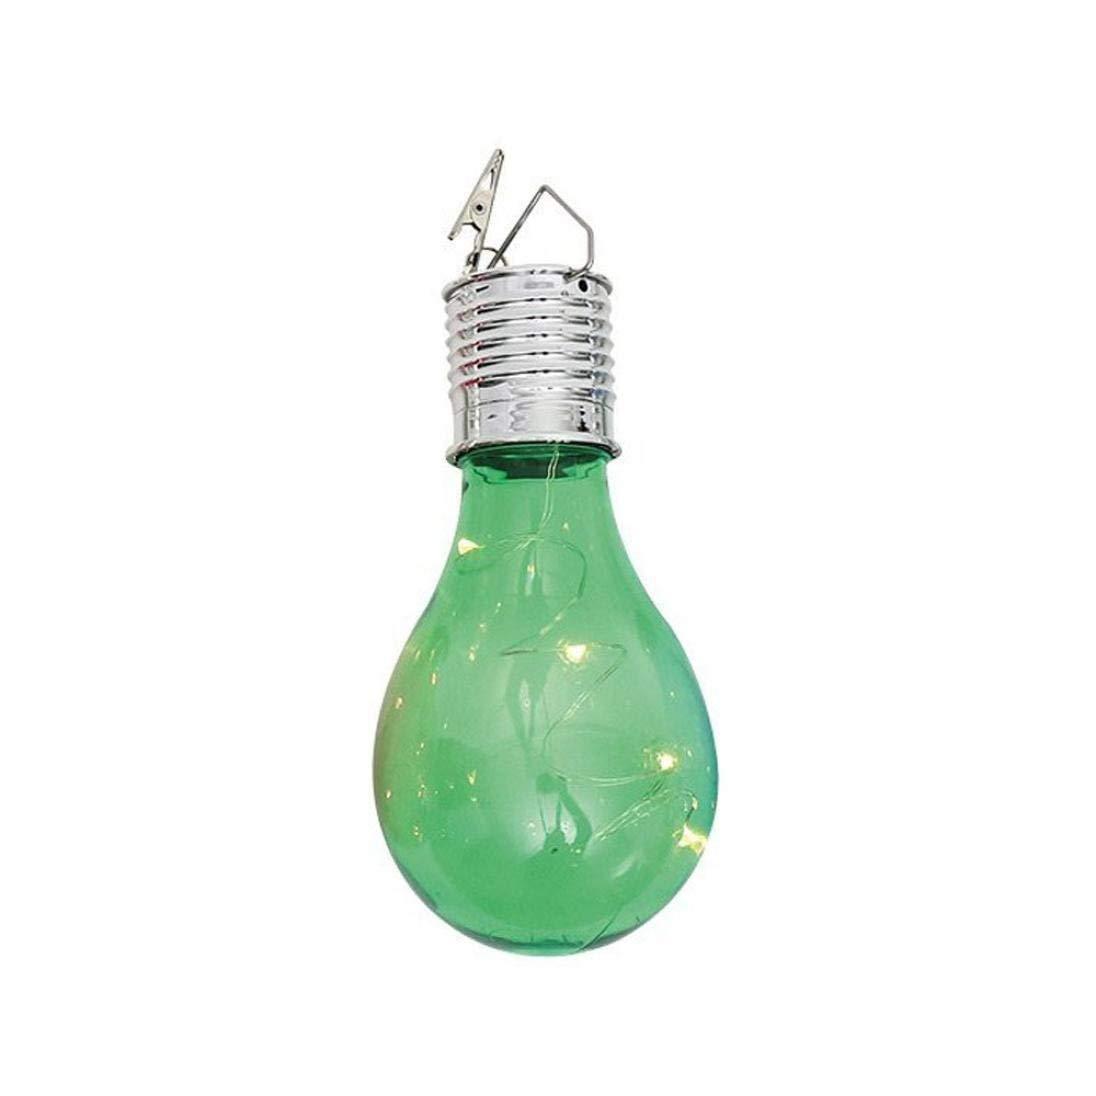 Yezijin Light Bulb, String Light, Waterproof Solar Rotatable Outdoor Garden Camping Hanging LED Light Lamp Bulb (Green)